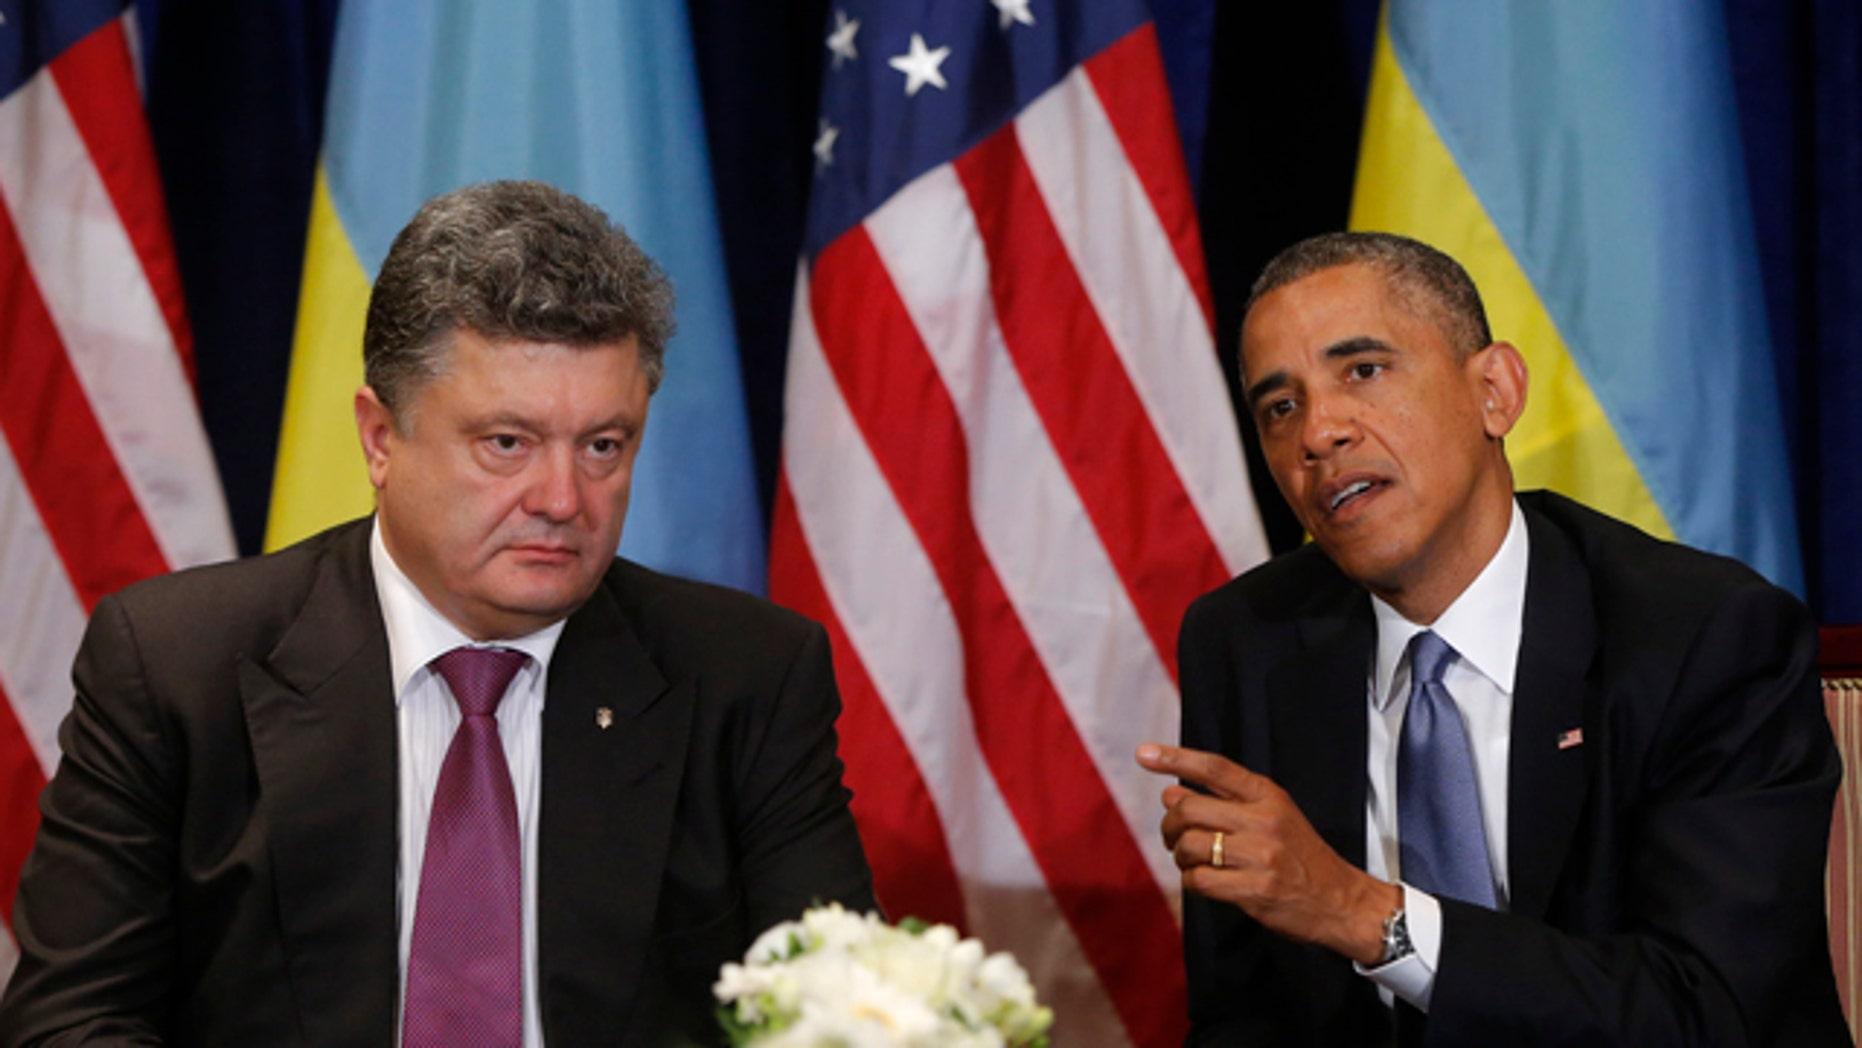 June 4, 2014: U.S. President Barack Obama, right, meets with Ukraine president-elect Petro Poroshenko in Warsaw, Poland. (AP Photo/Charles Dharapak)